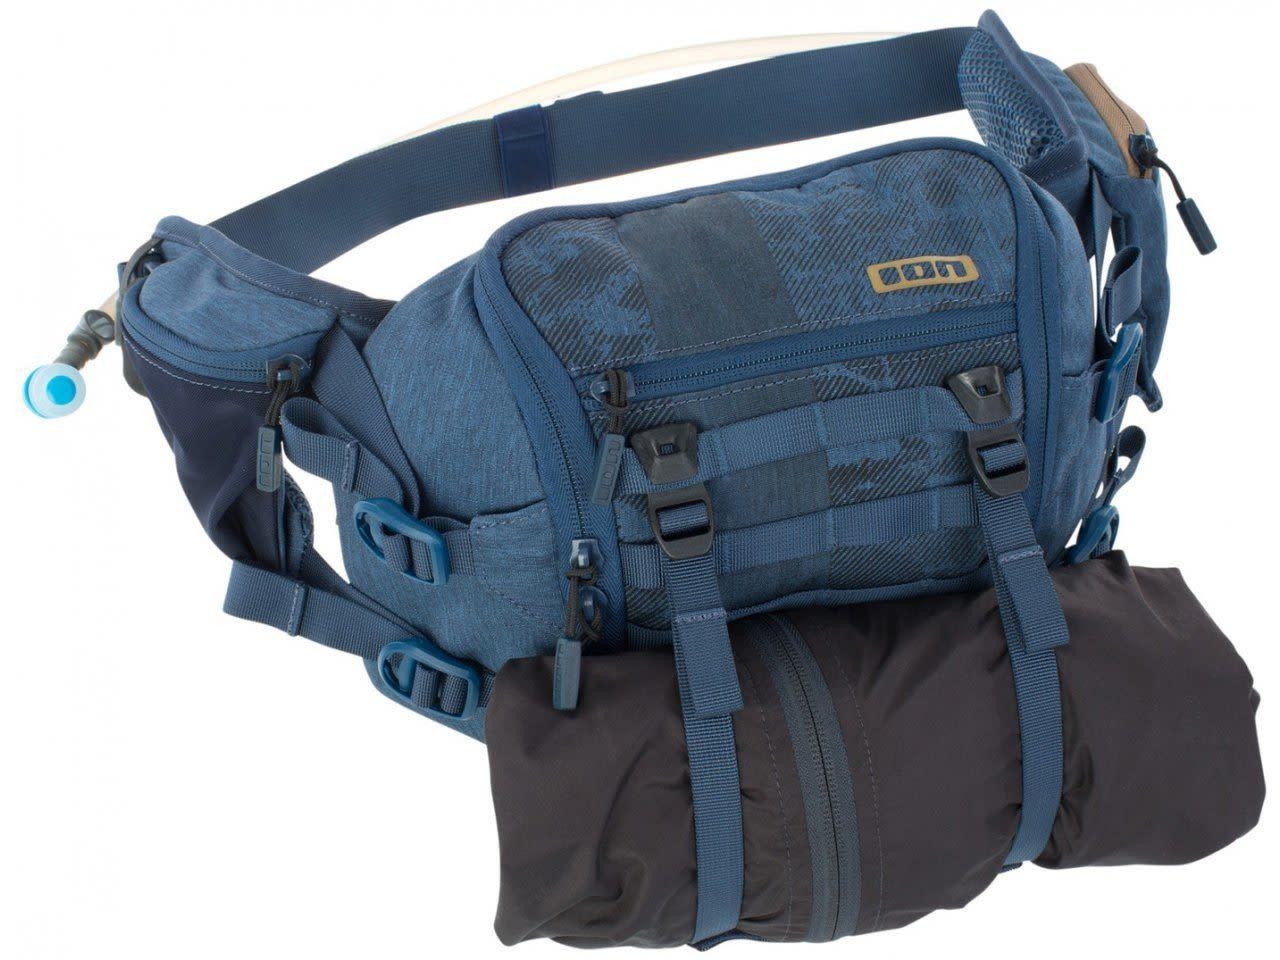 ION Hip Pack, Ion Plus Traze 3 Hip Bag